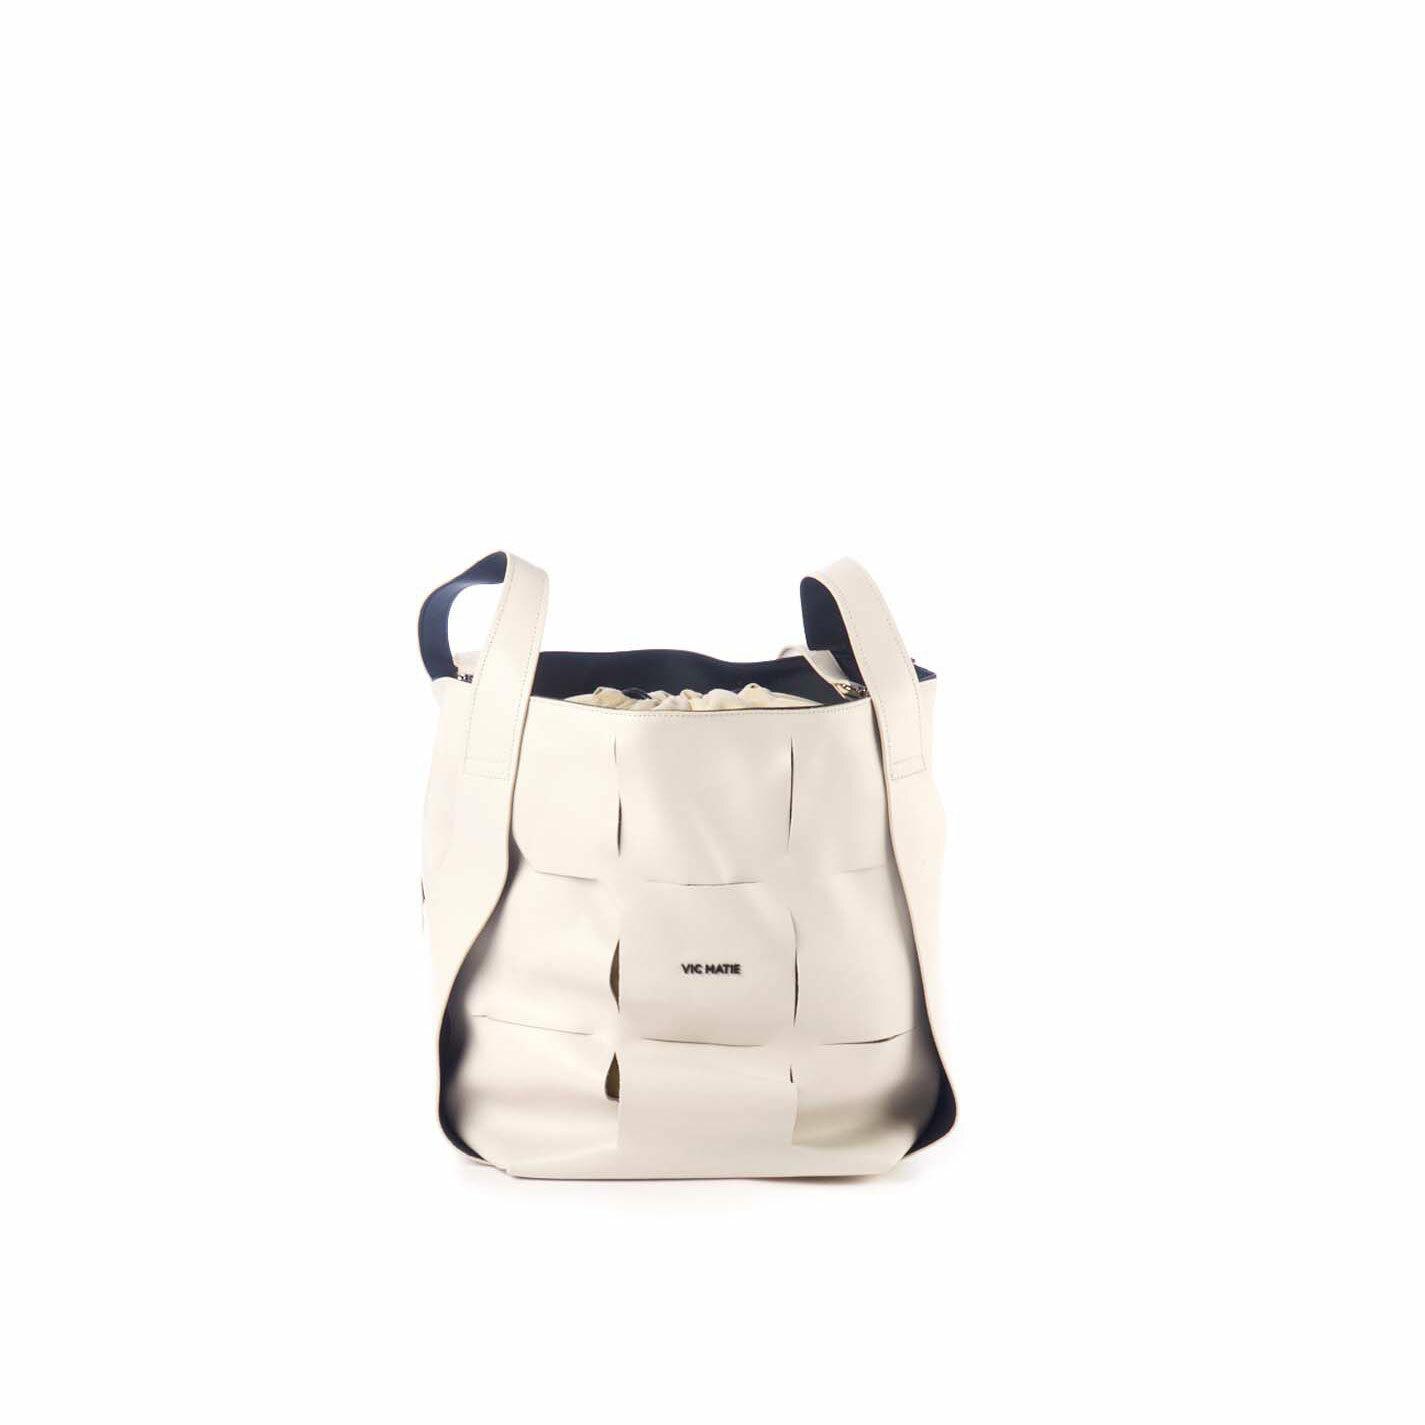 Nadege<br />Large ivory-coloured leather bucket bag